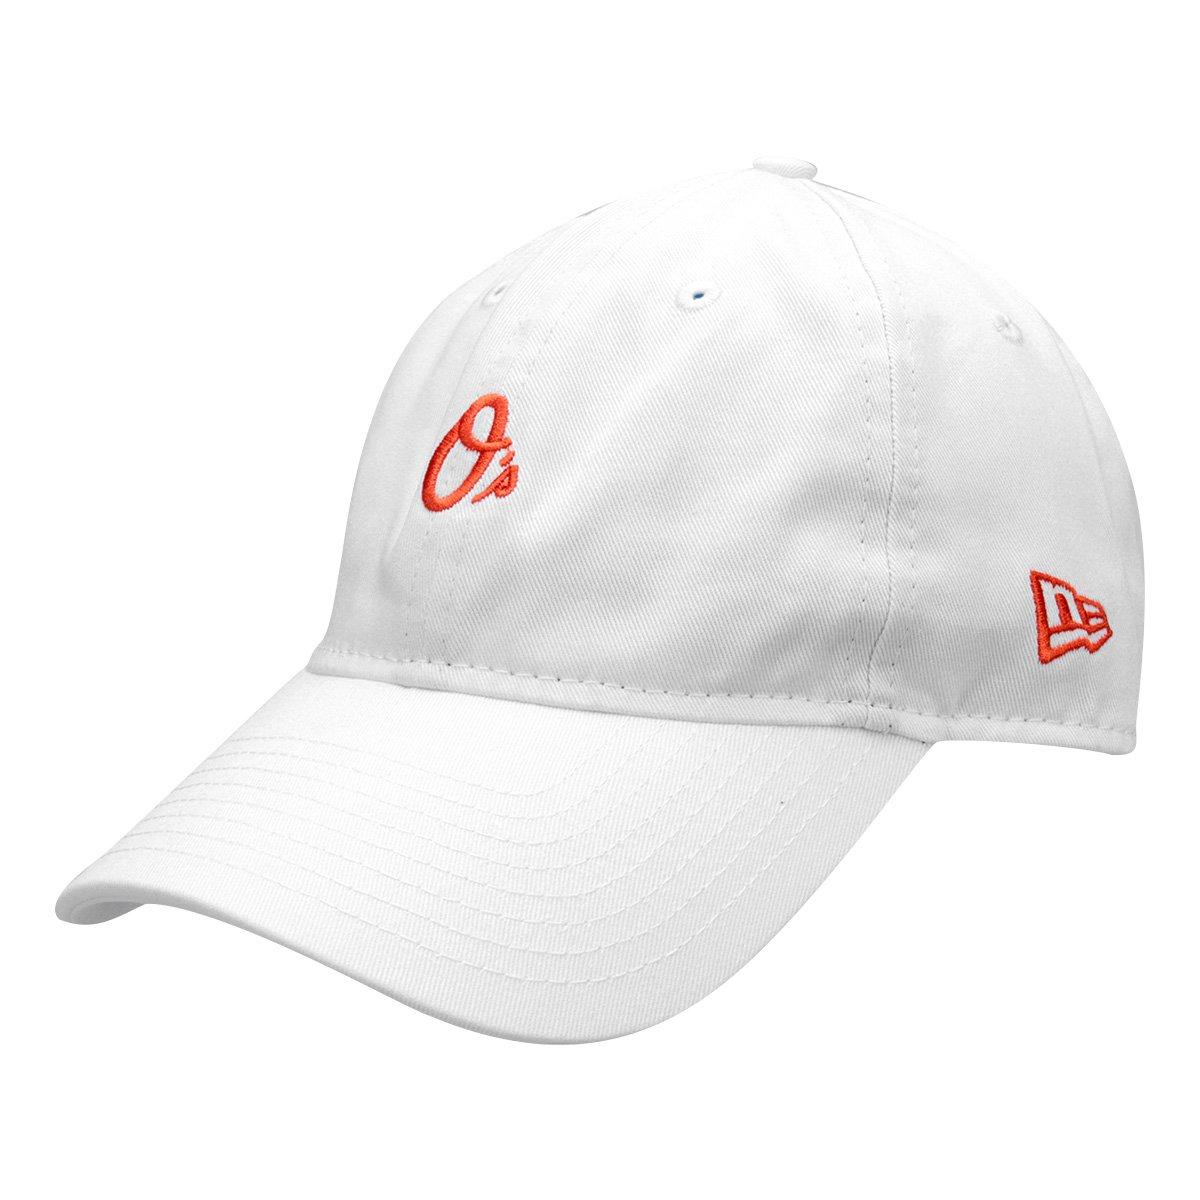 Boné New Era MLB Baltimore Orioles Aba Curva 940 St 2041 Balori ... 28598a41b77